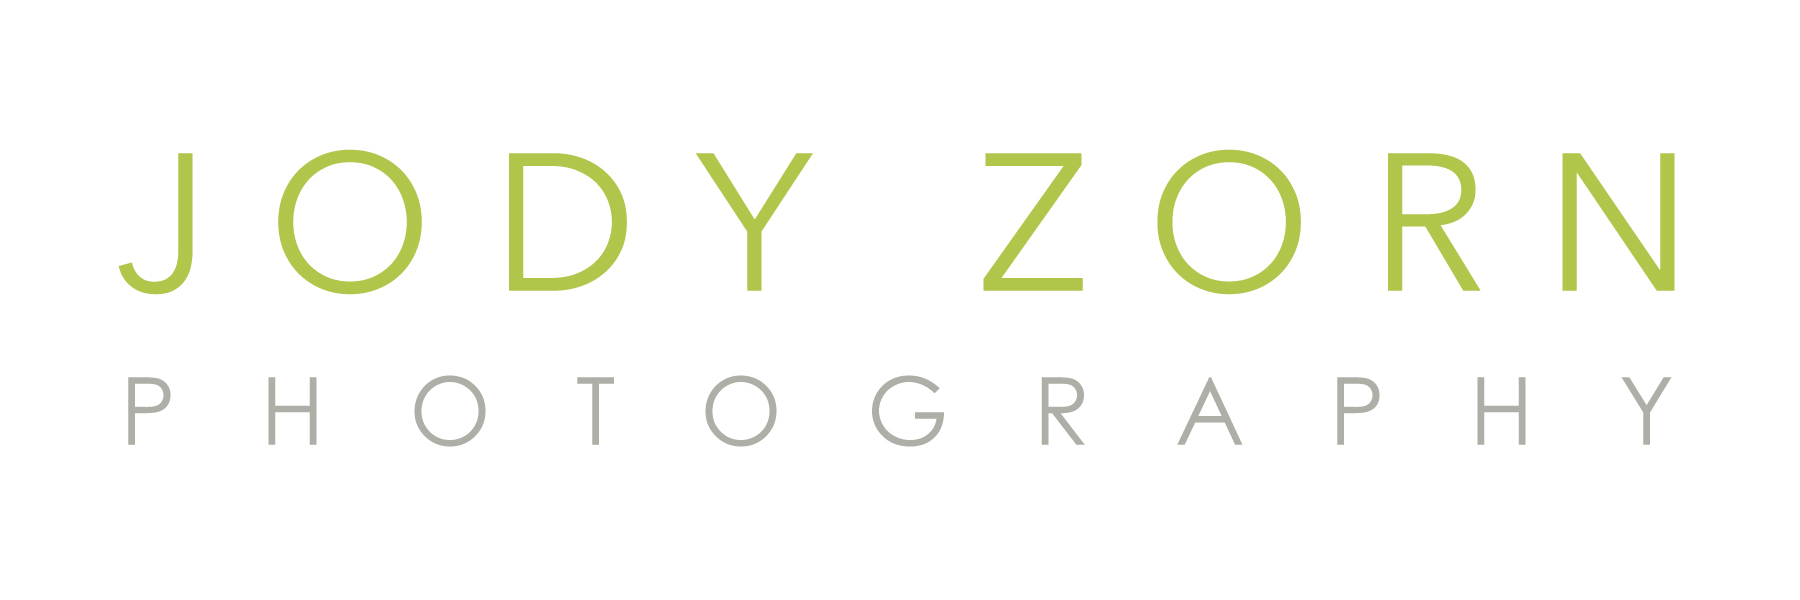 JodyZornLogoFinal3cropped.jpg